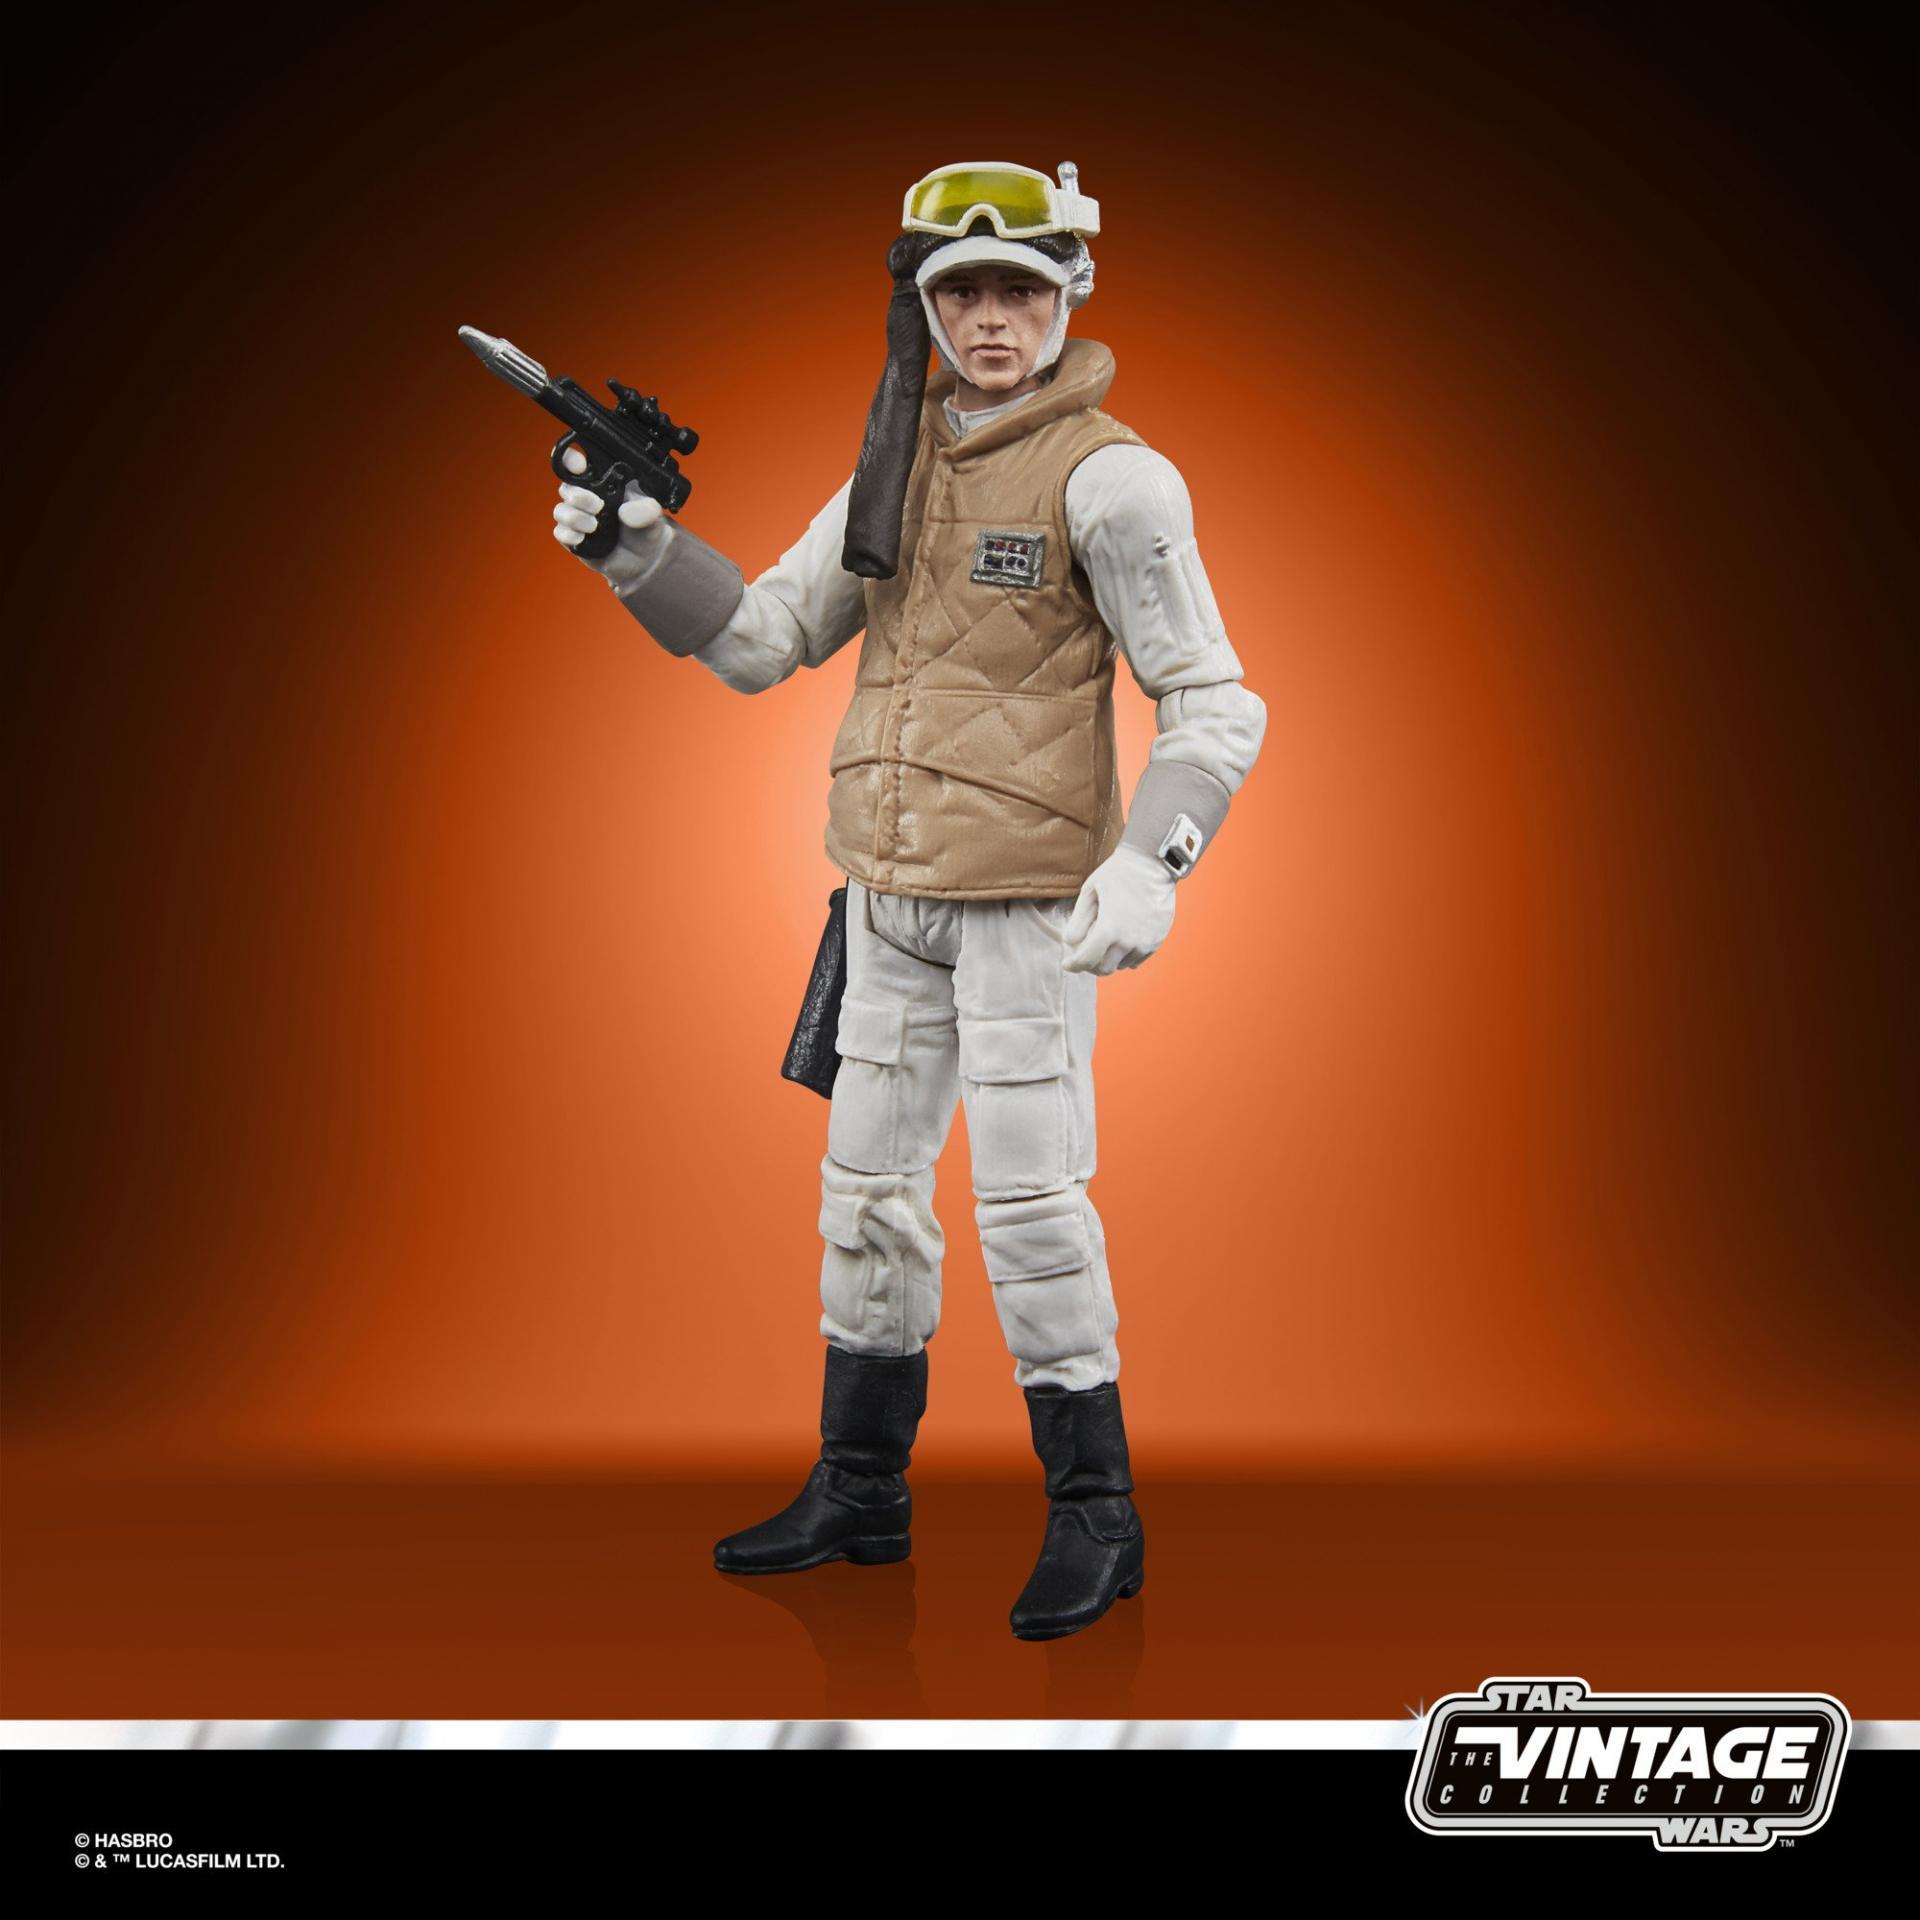 Star wars the vintage collection rebel soldier echo base battle gear